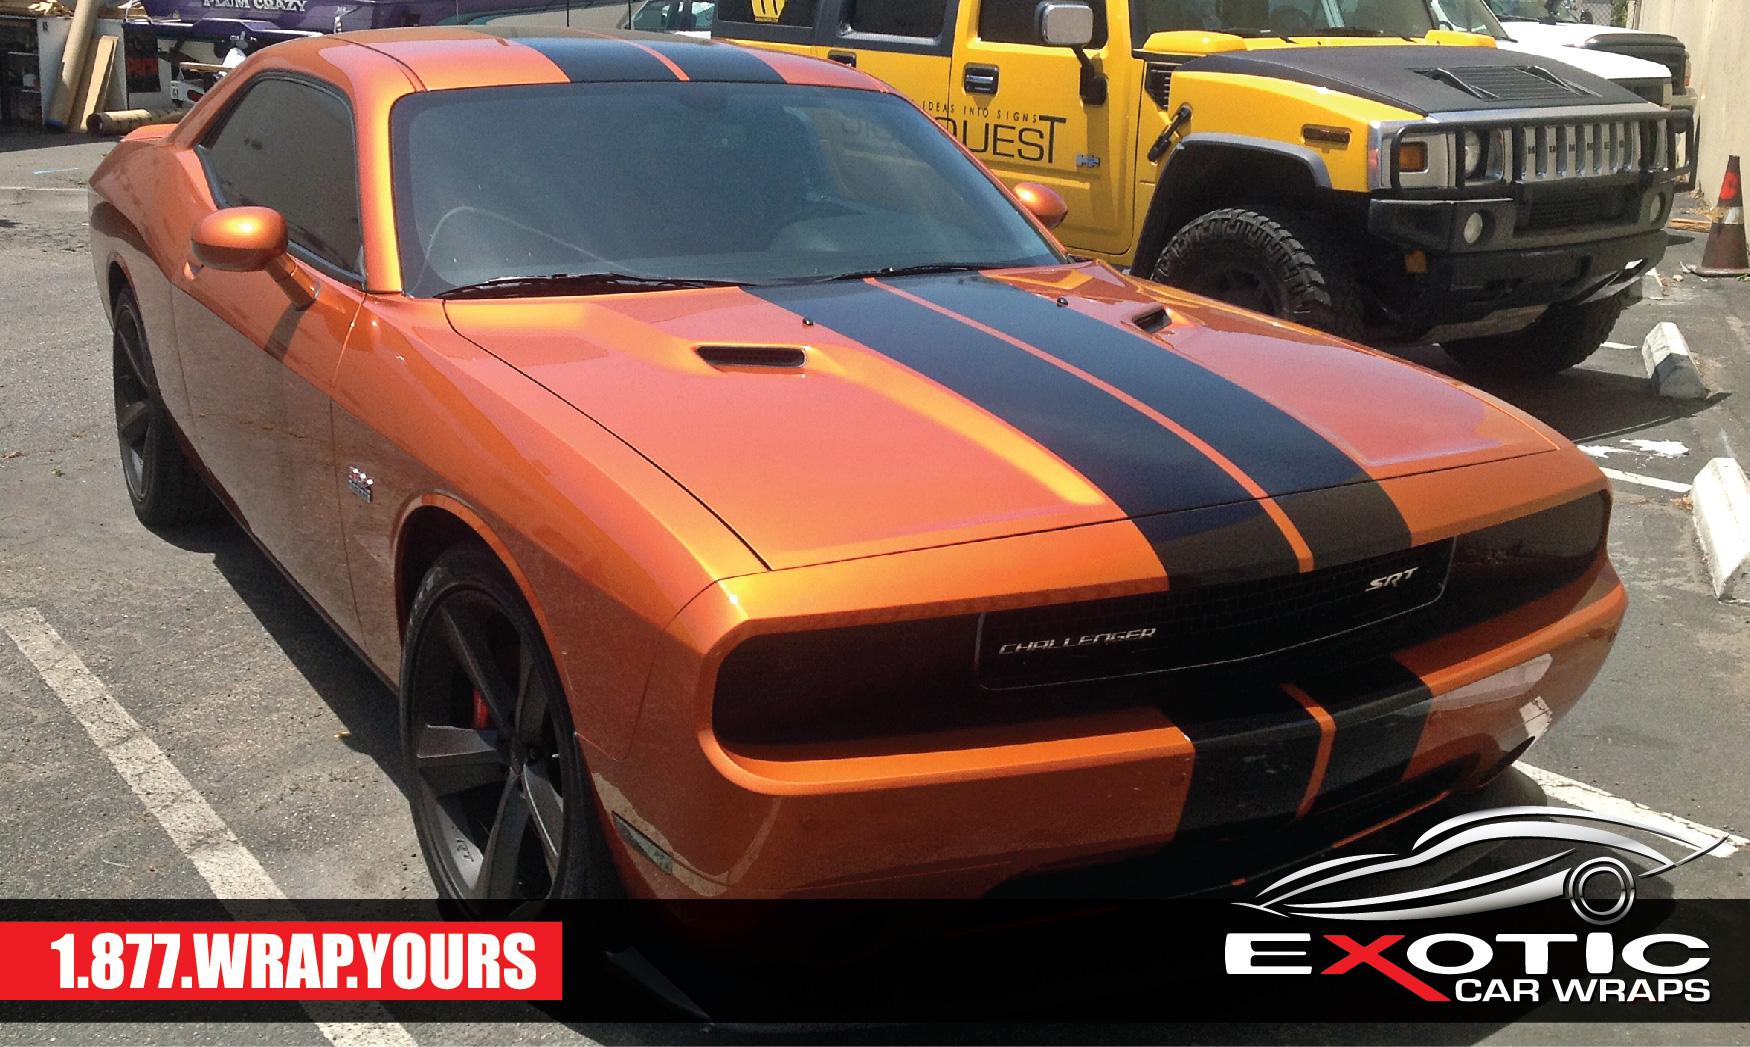 Exotic_car_wraps47.jpg